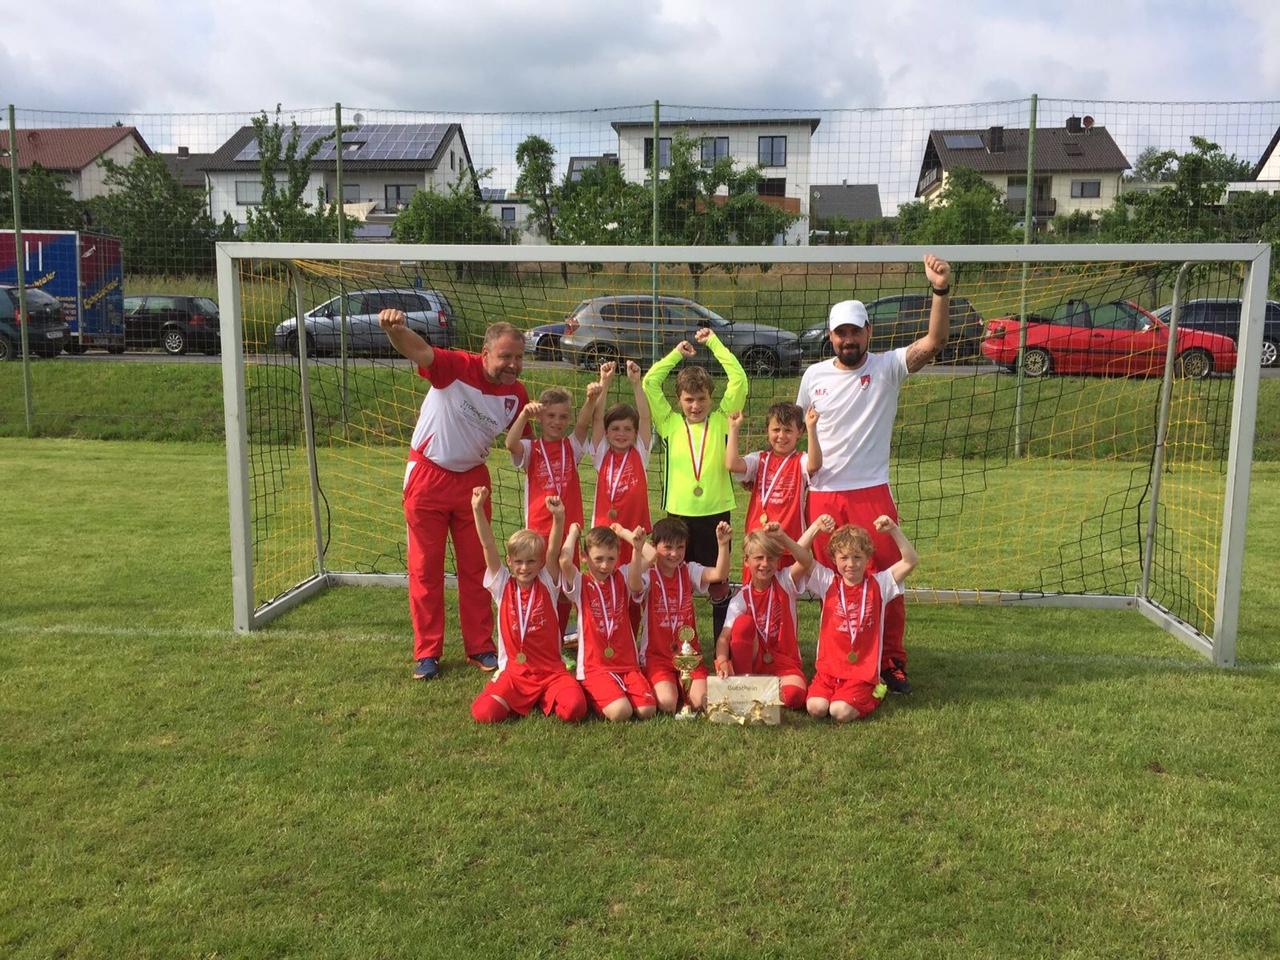 28.06.2016 U9 Ploppelcup -Sieger 2016 in Eckartshauen